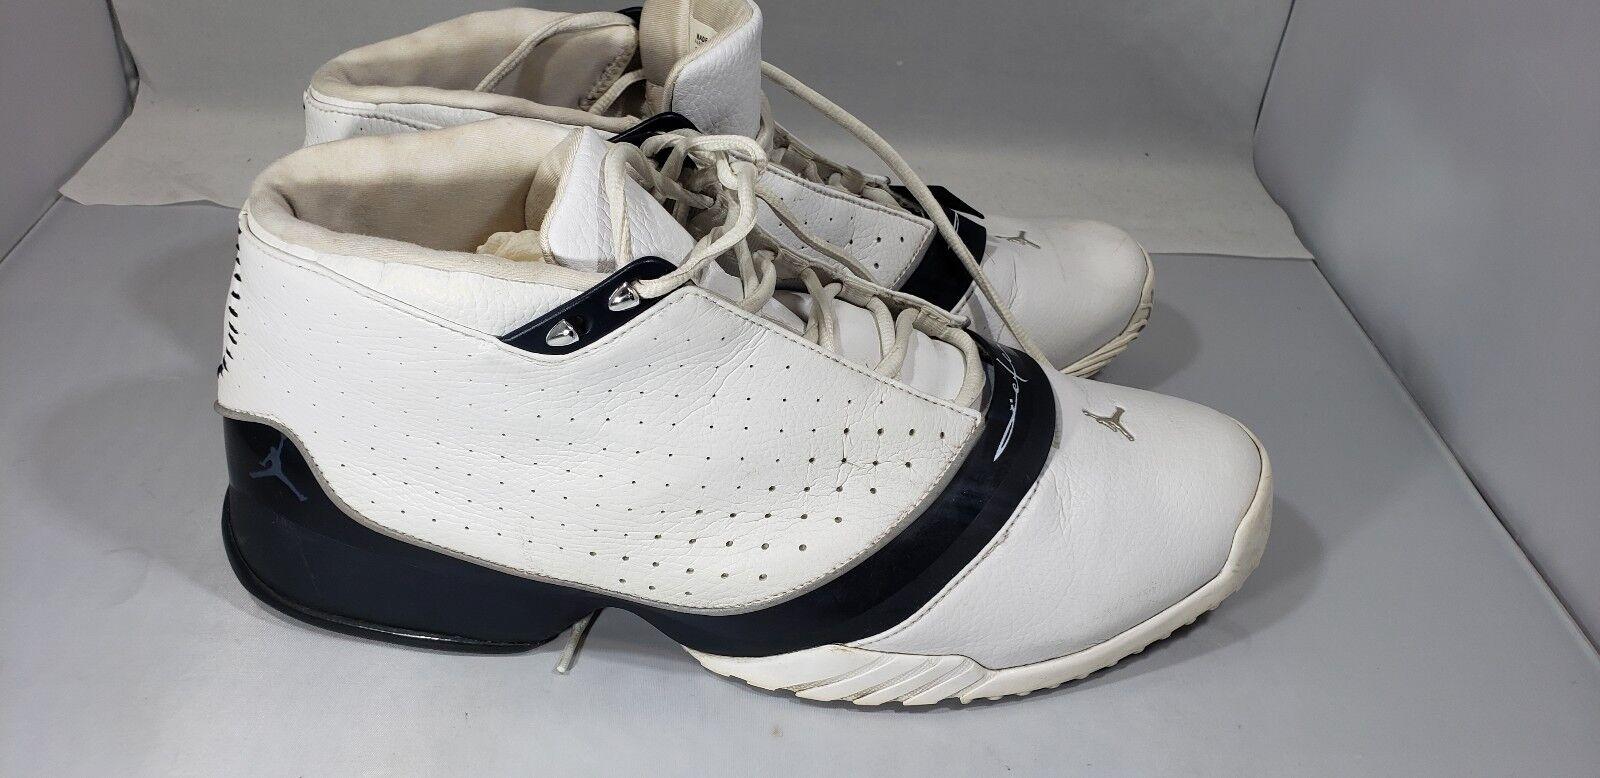 Nike Air Jordan Jeter Jumpman Jet Mens Size 14 040406 LN2 White Black Derek